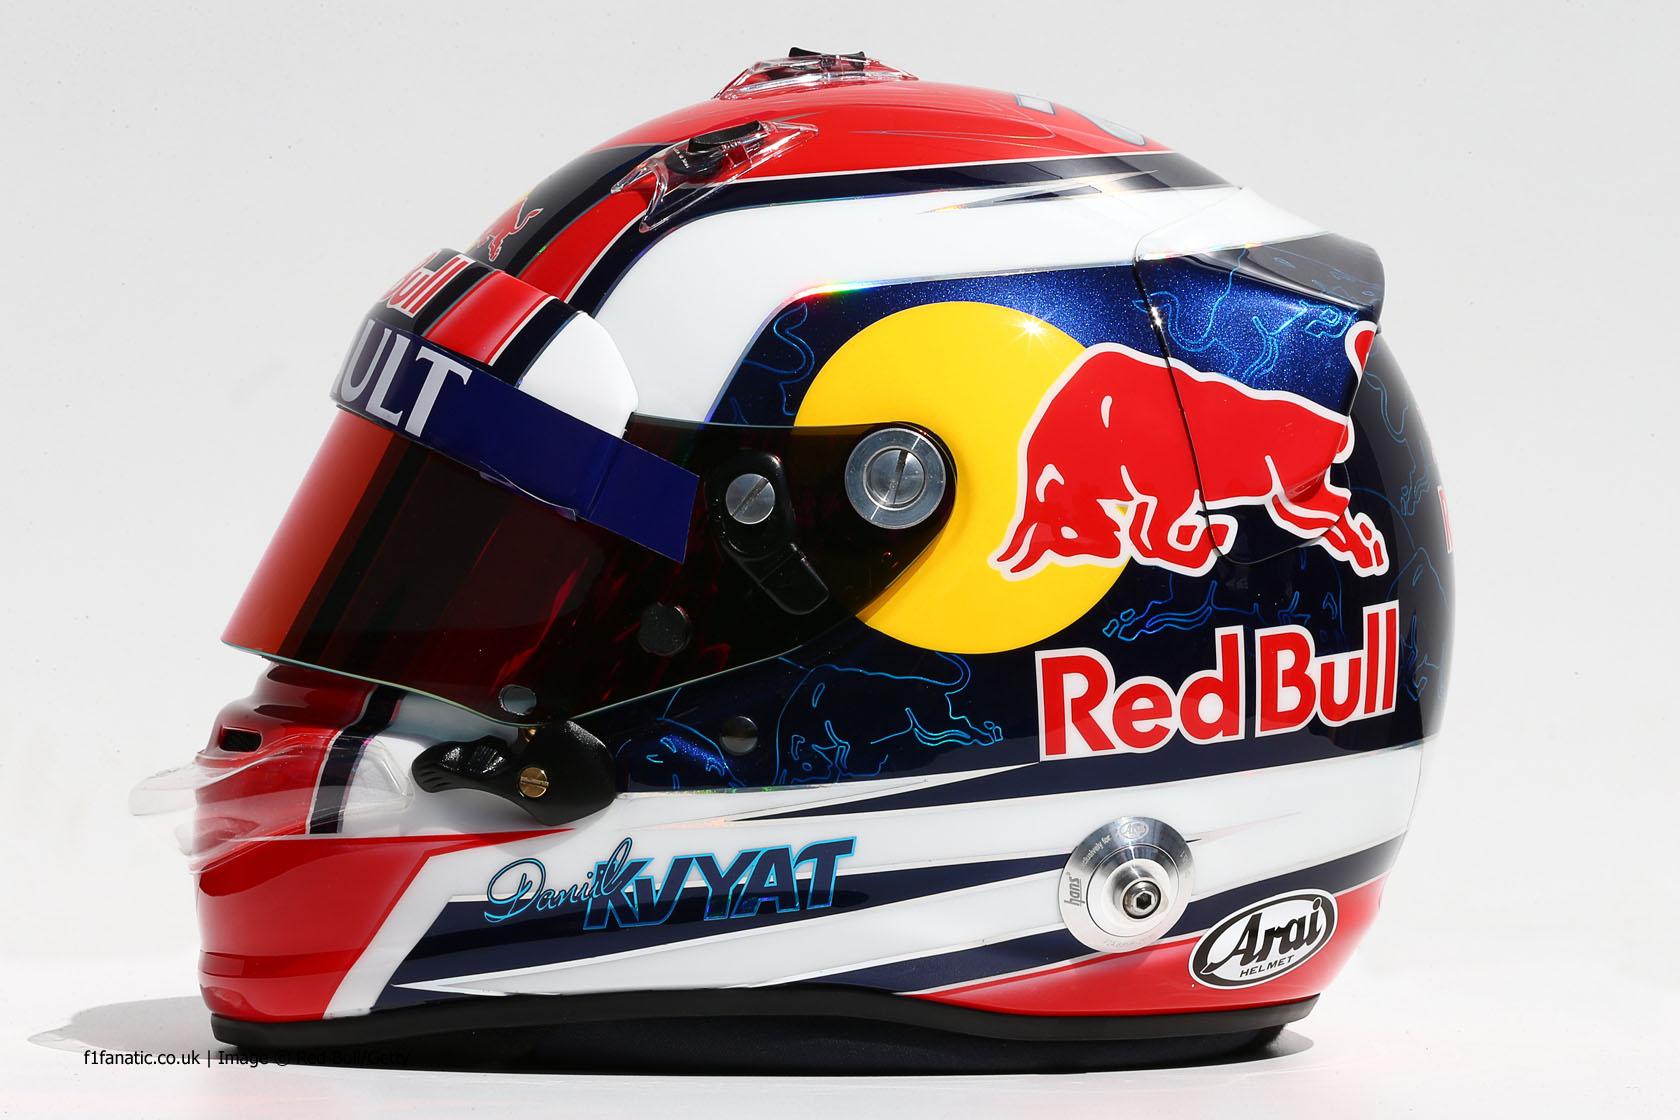 Daniil Kvyat, Toro Rosso, helmet, 2014